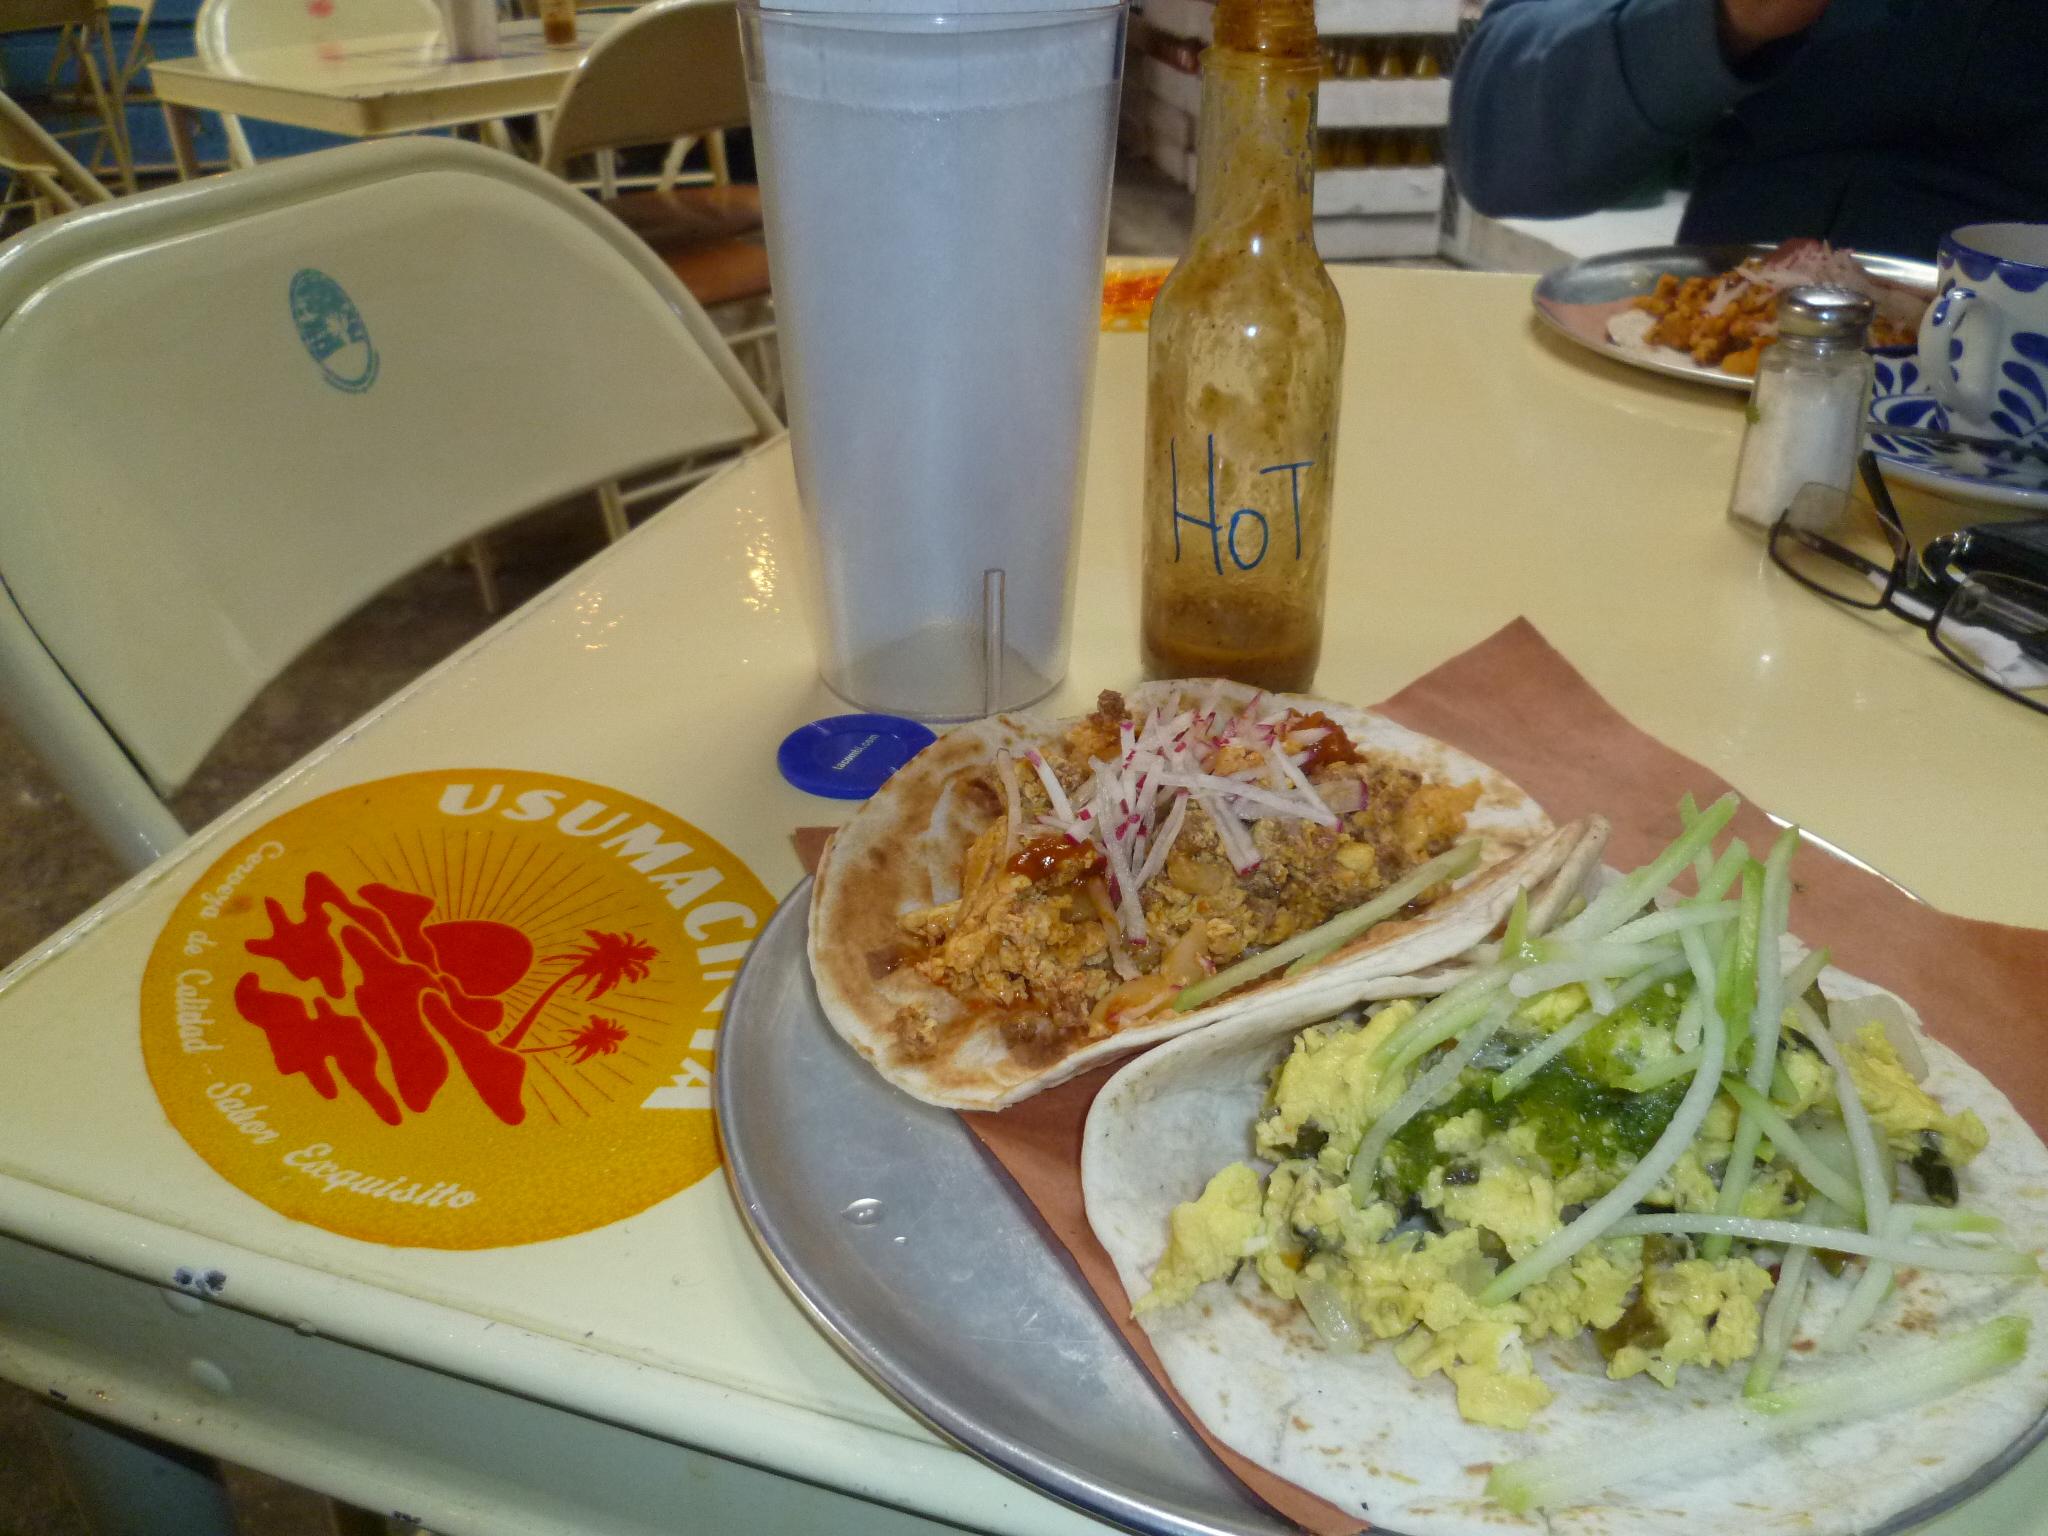 New York - Breakfast Tacos